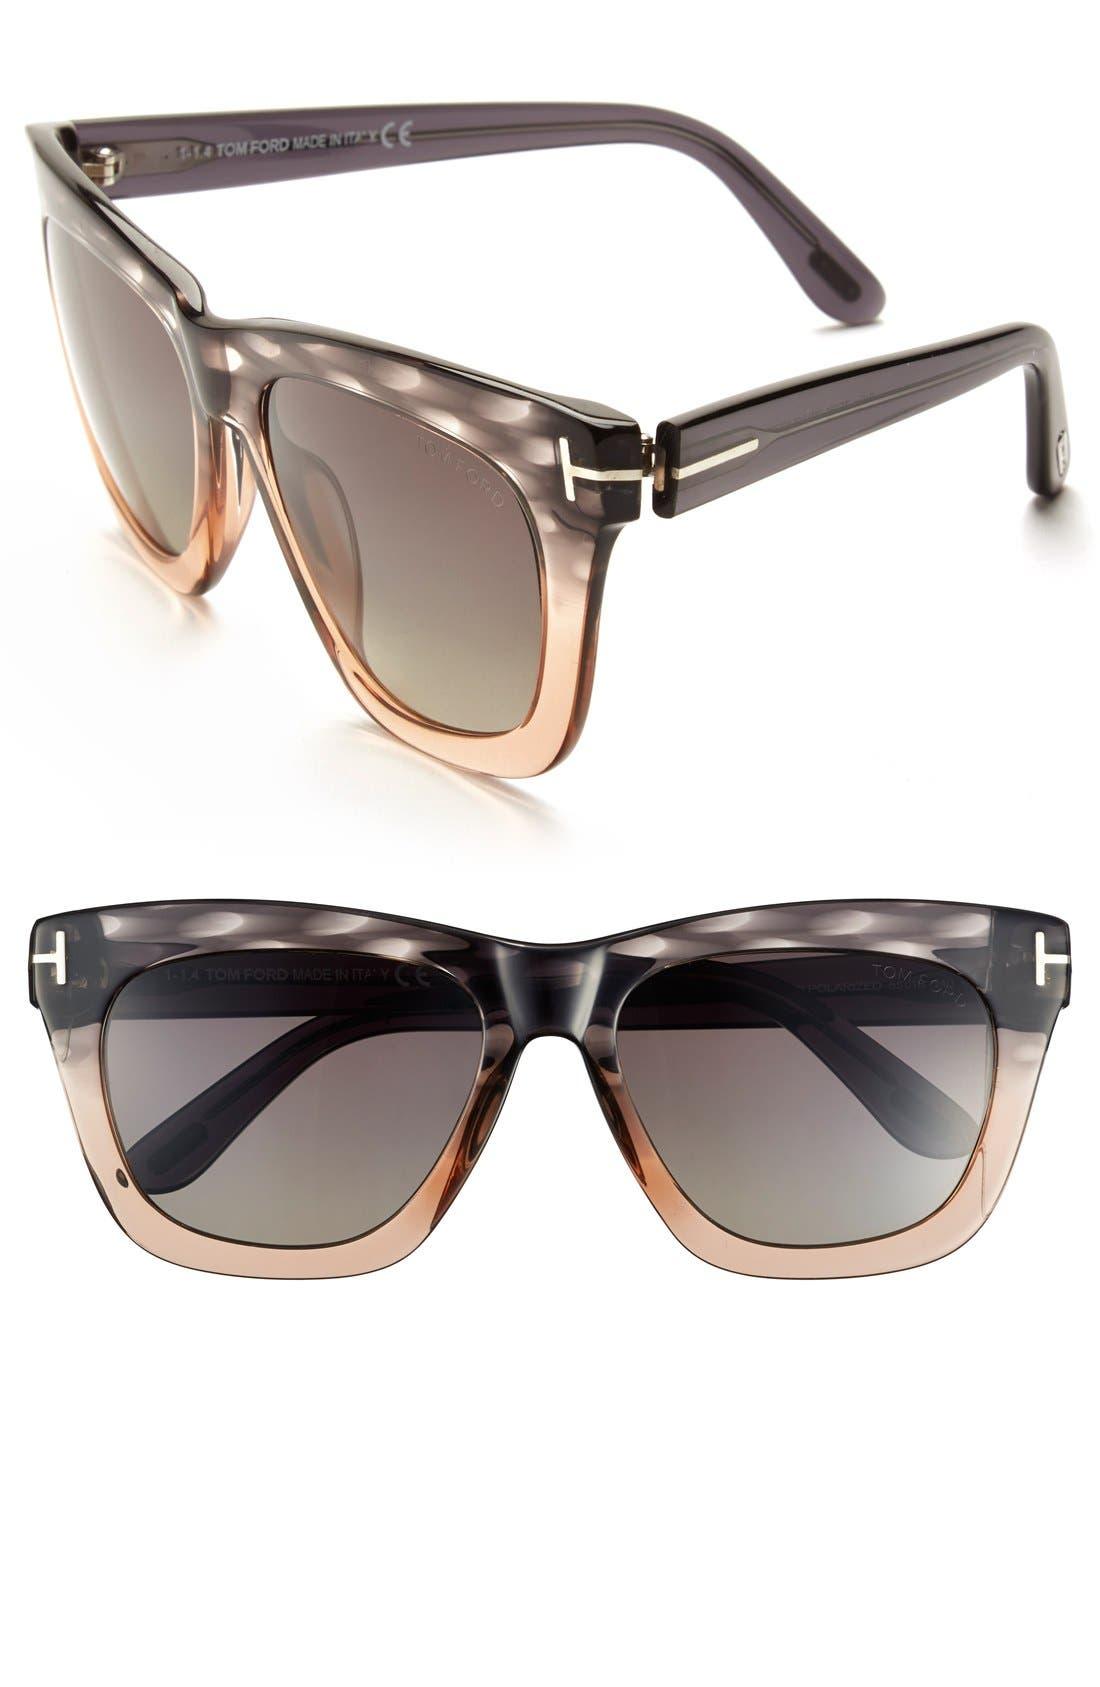 Alternate Image 1 Selected - Tom Ford 'Celina' 55mm Polarized Sunglasses